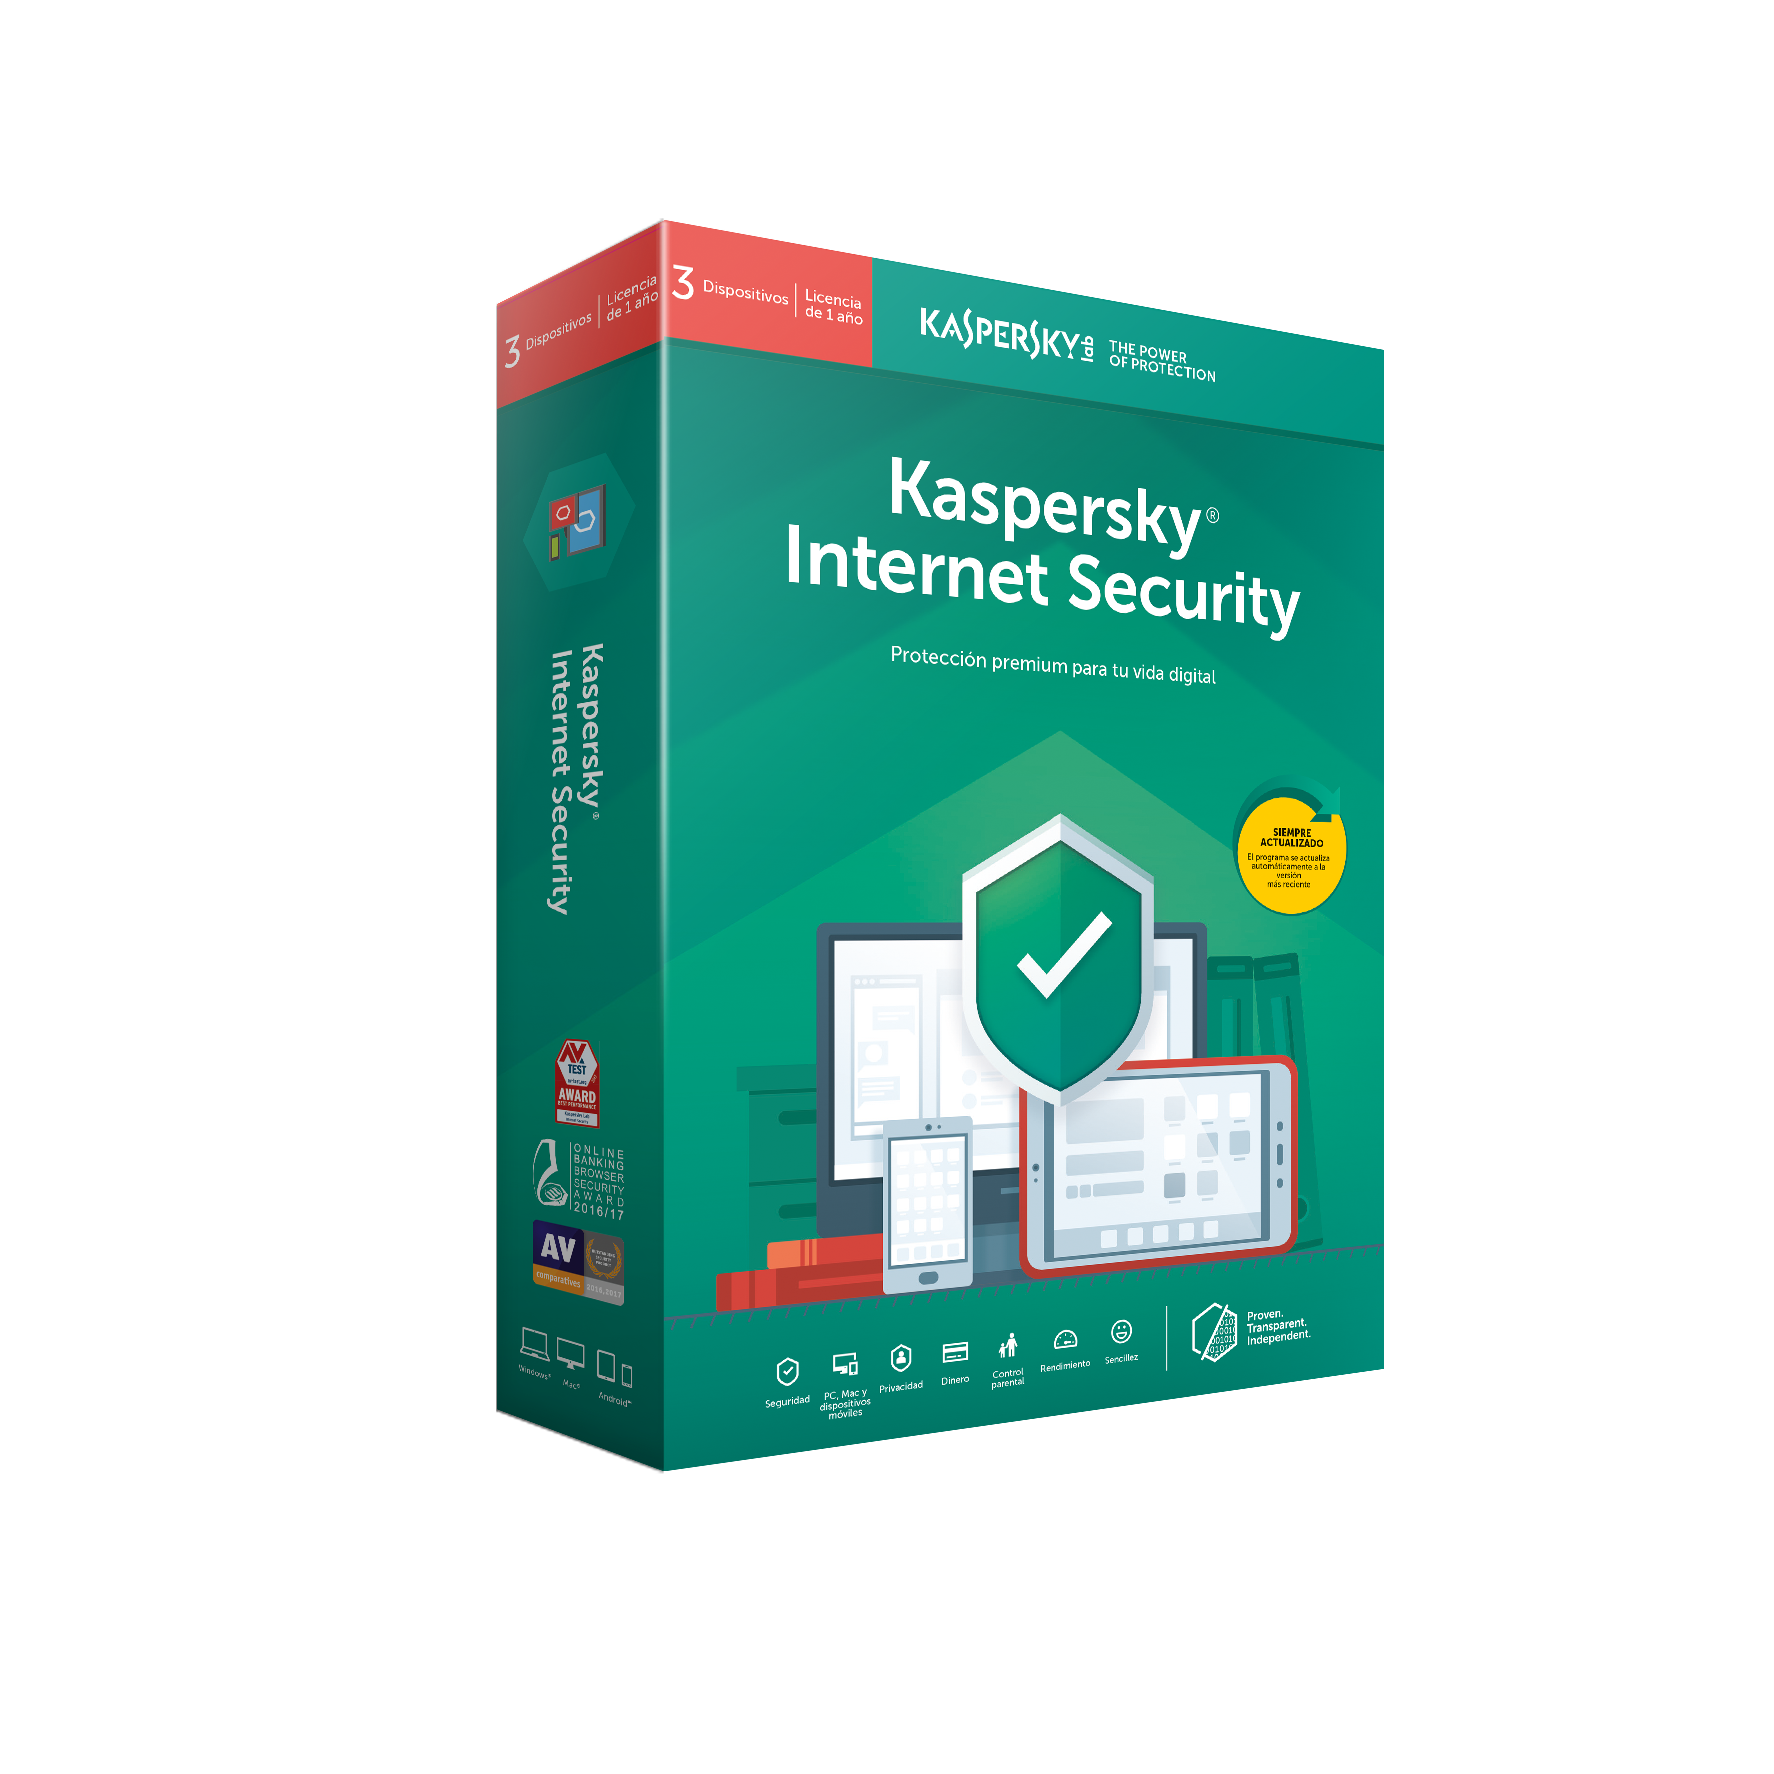 ANTIVIRUS KASPERSKY 2019 3 US INT SECURITY